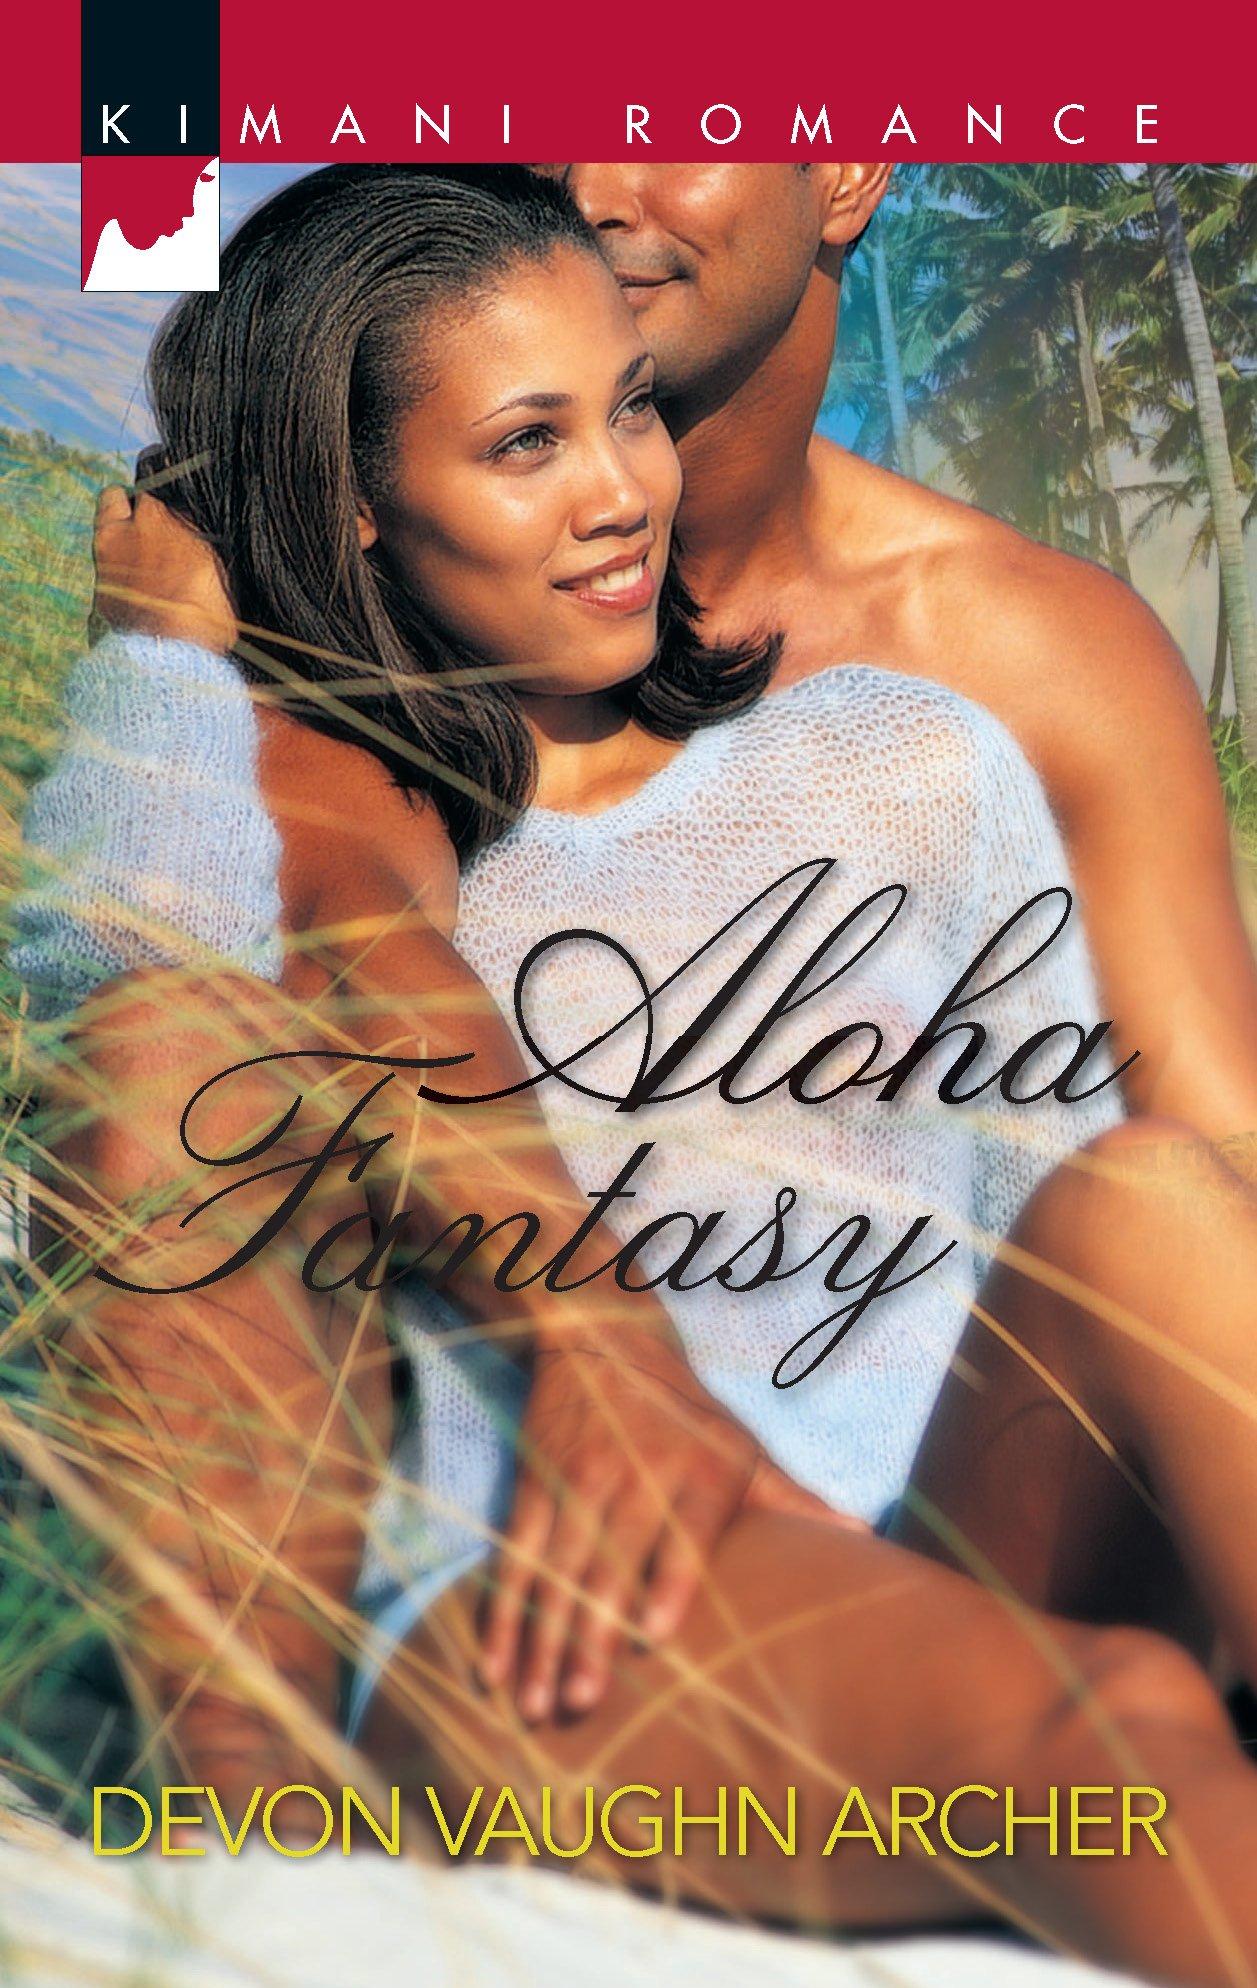 Buy Aloha Fantasy (Kimani Romance) Book Online at Low Prices in India |  Aloha Fantasy (Kimani Romance) Reviews & Ratings - Amazon.in